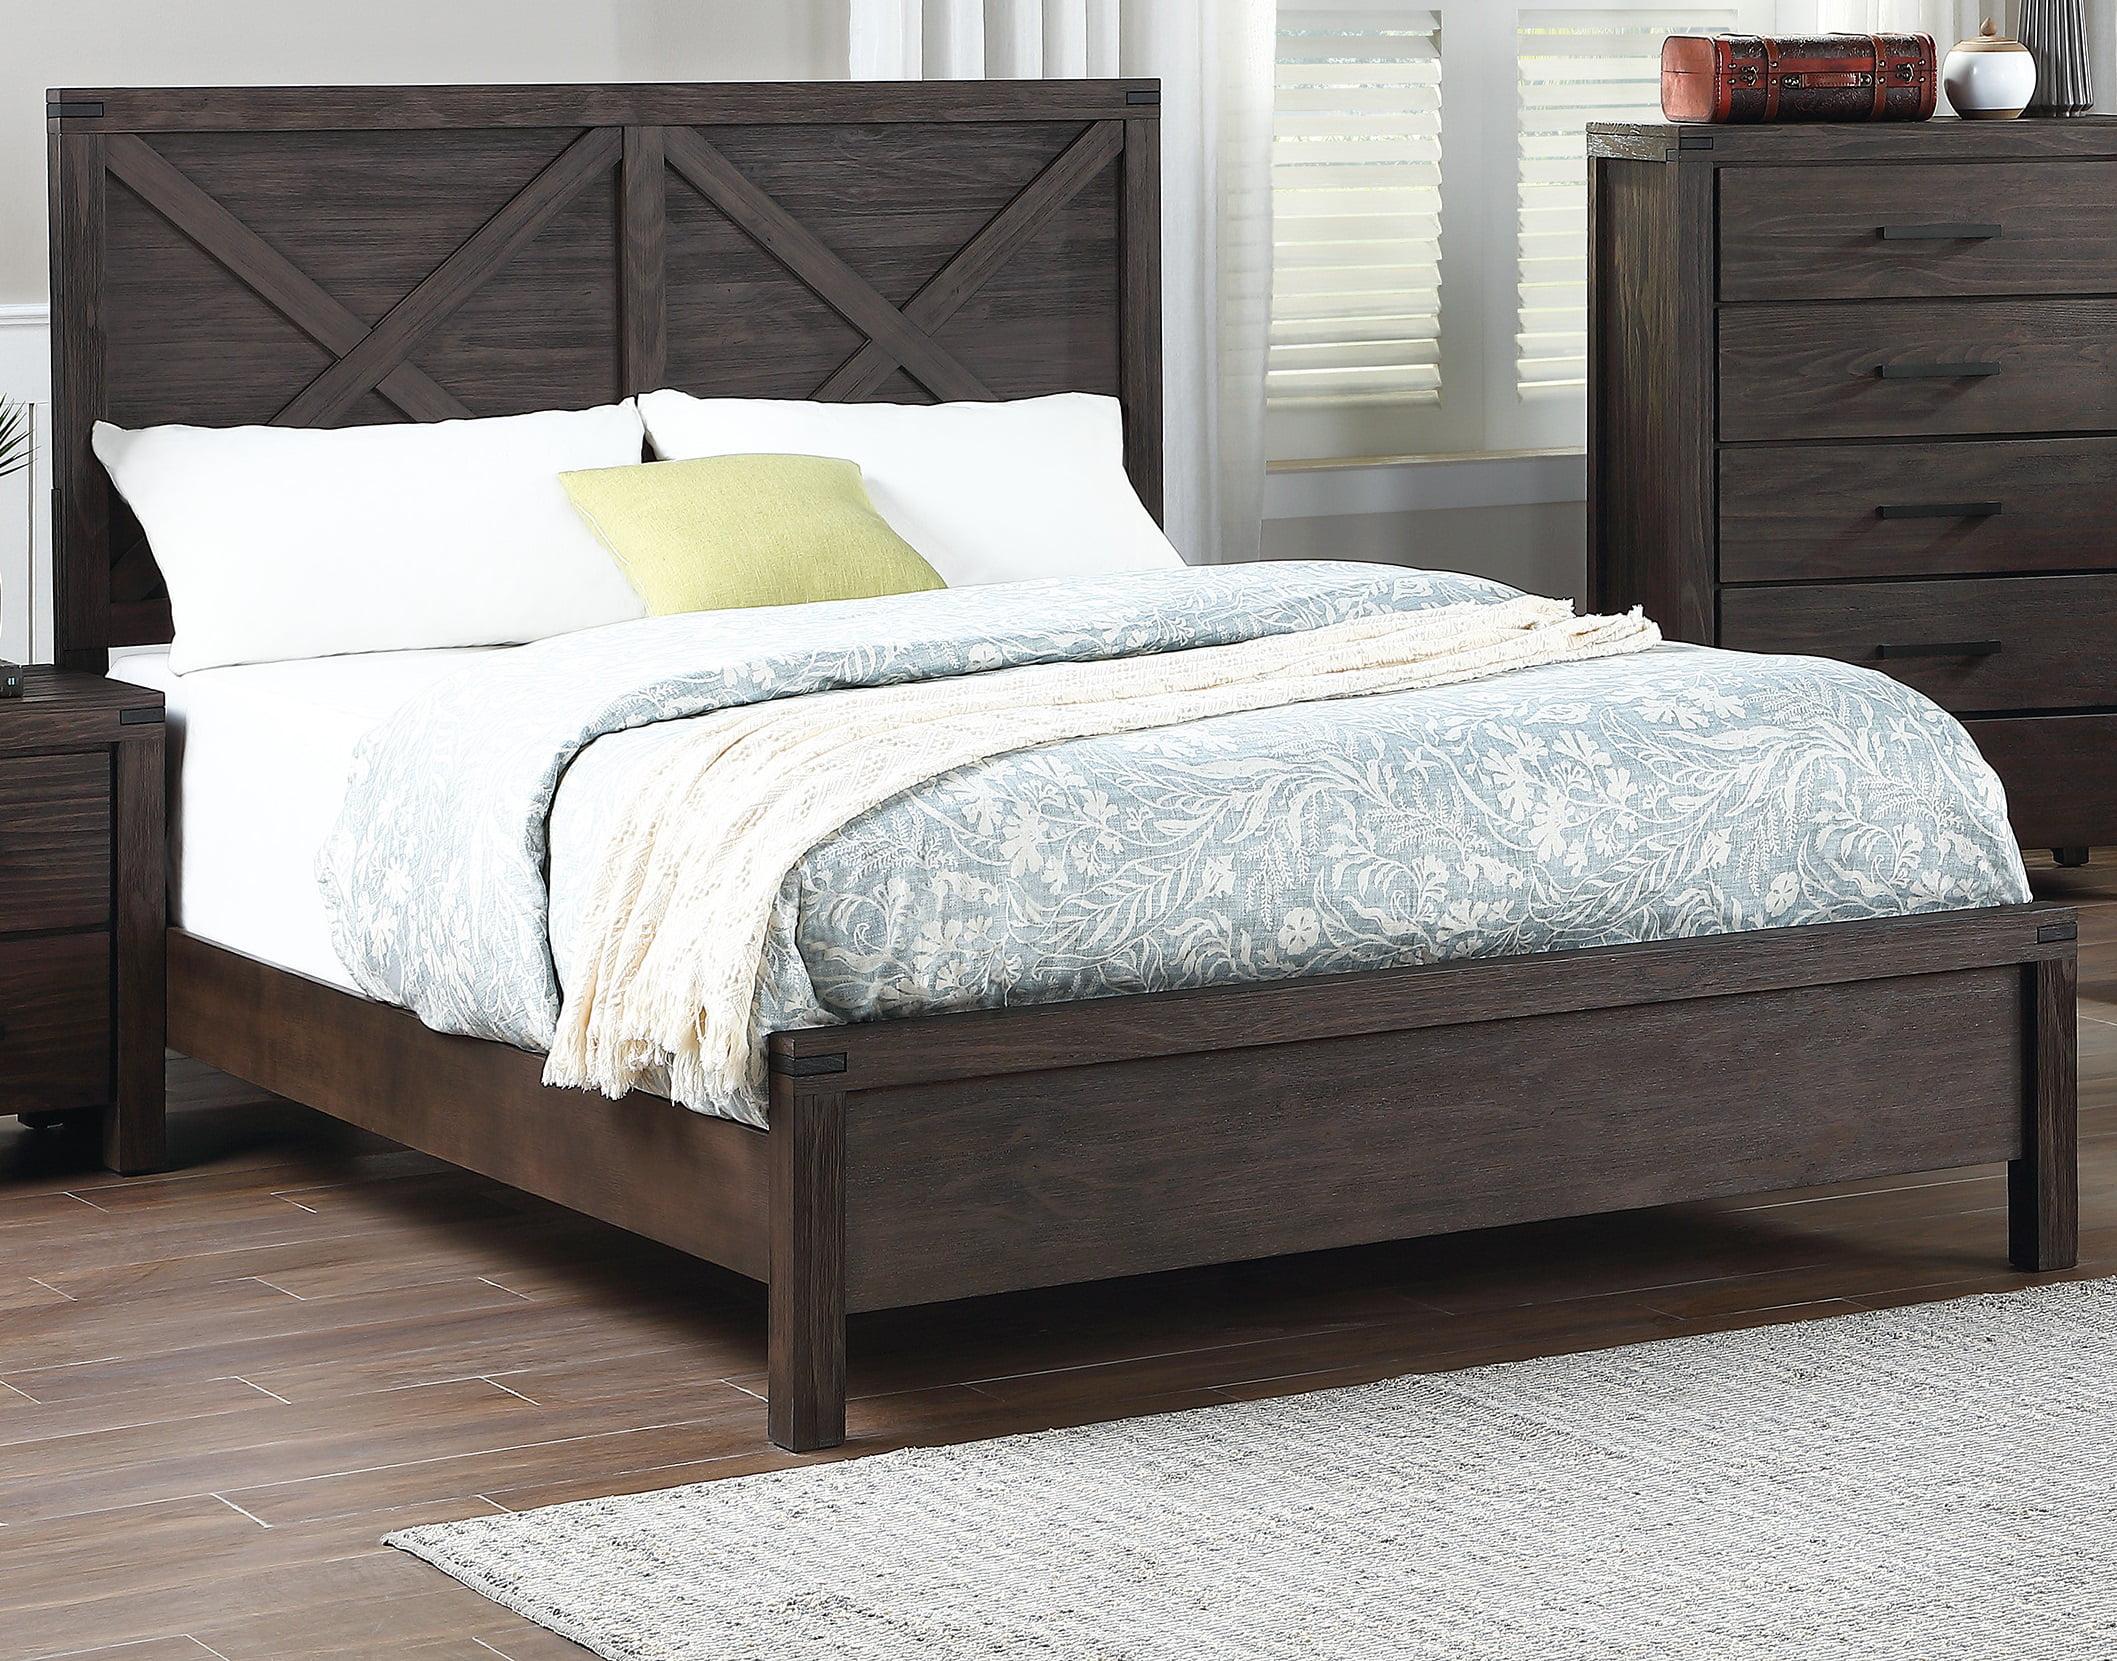 Modern Contemporary Unique Headboard Design Eastern King Size Bed 1pc Bedroom Furniture Plywood Solid Wood Walmart Com Walmart Com